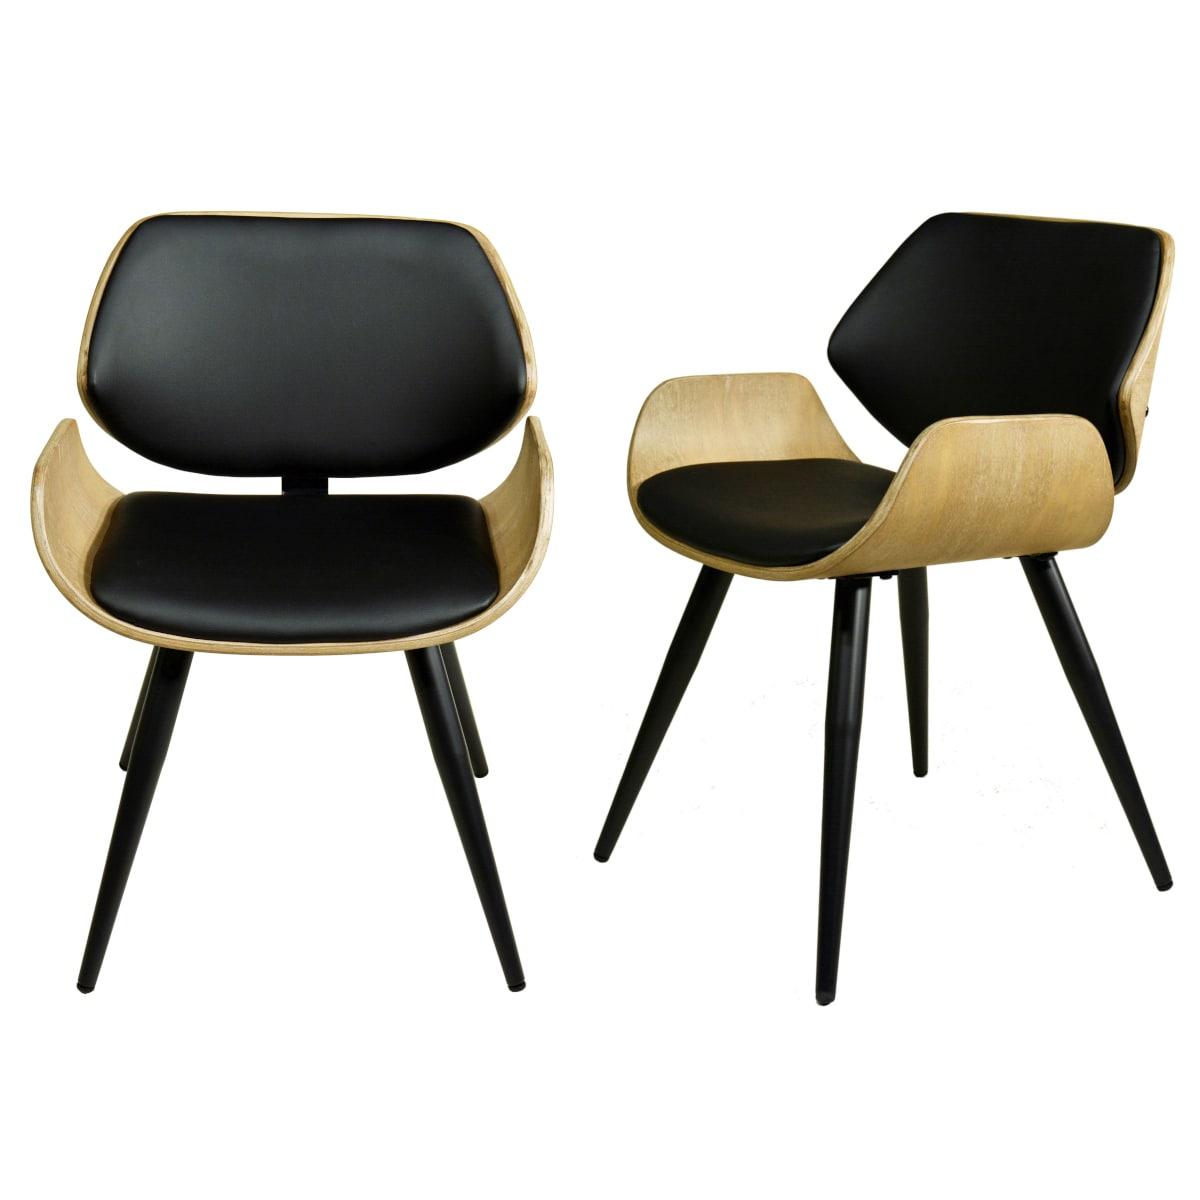 Formholz Stühle gepolstert